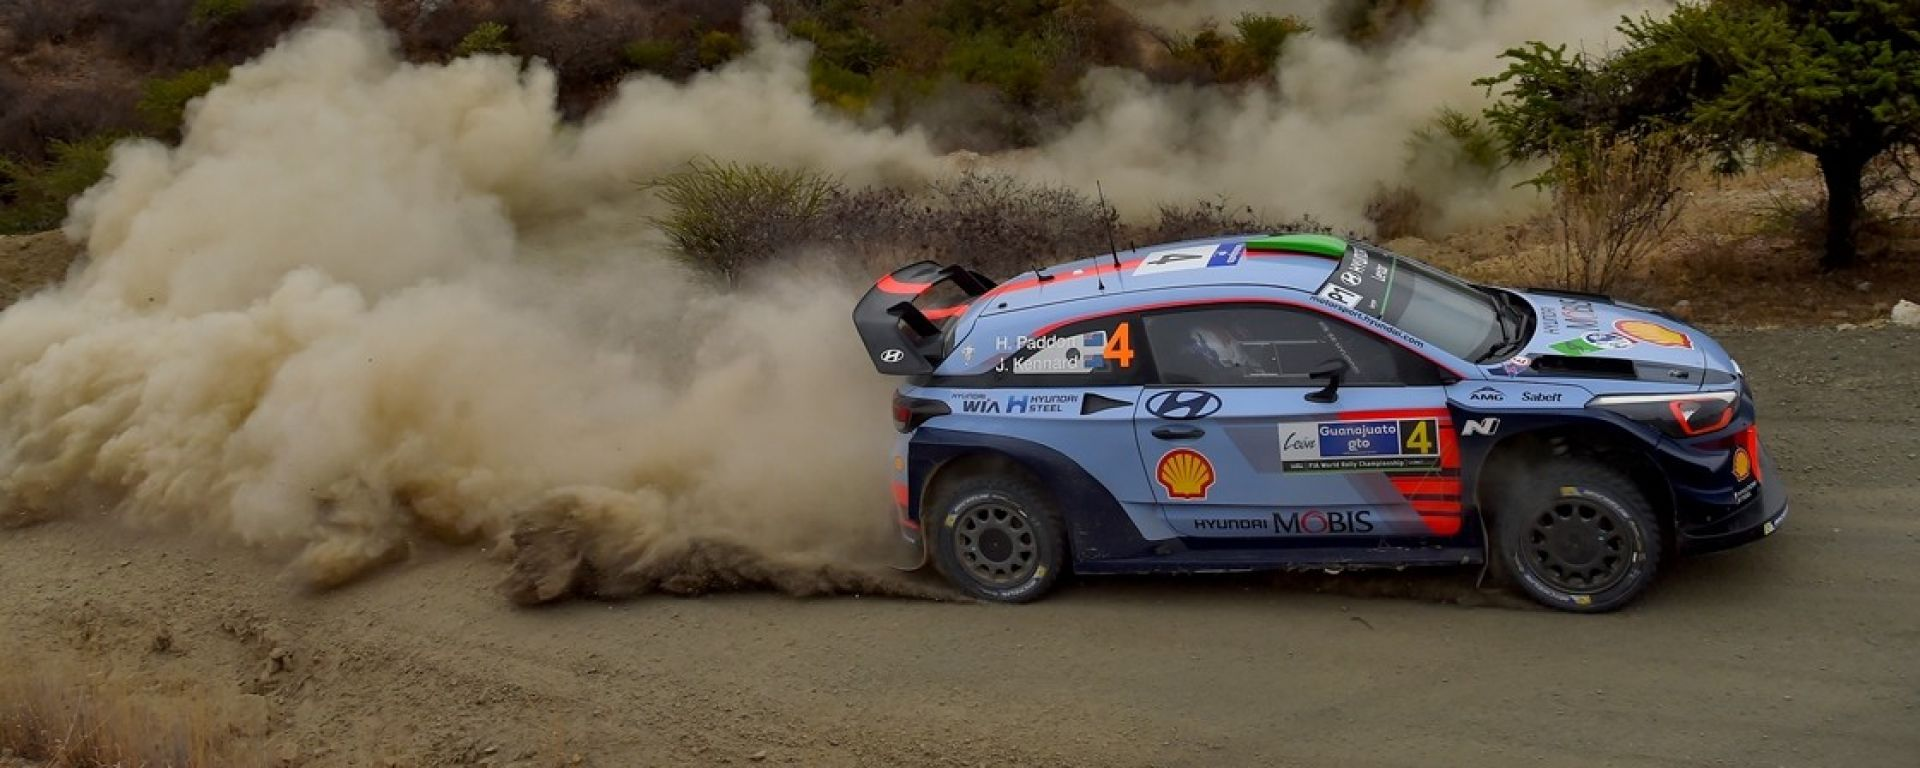 Mikkelsen guiderà la Hyundai i20 nelle ultime tre gare del WRC 2017